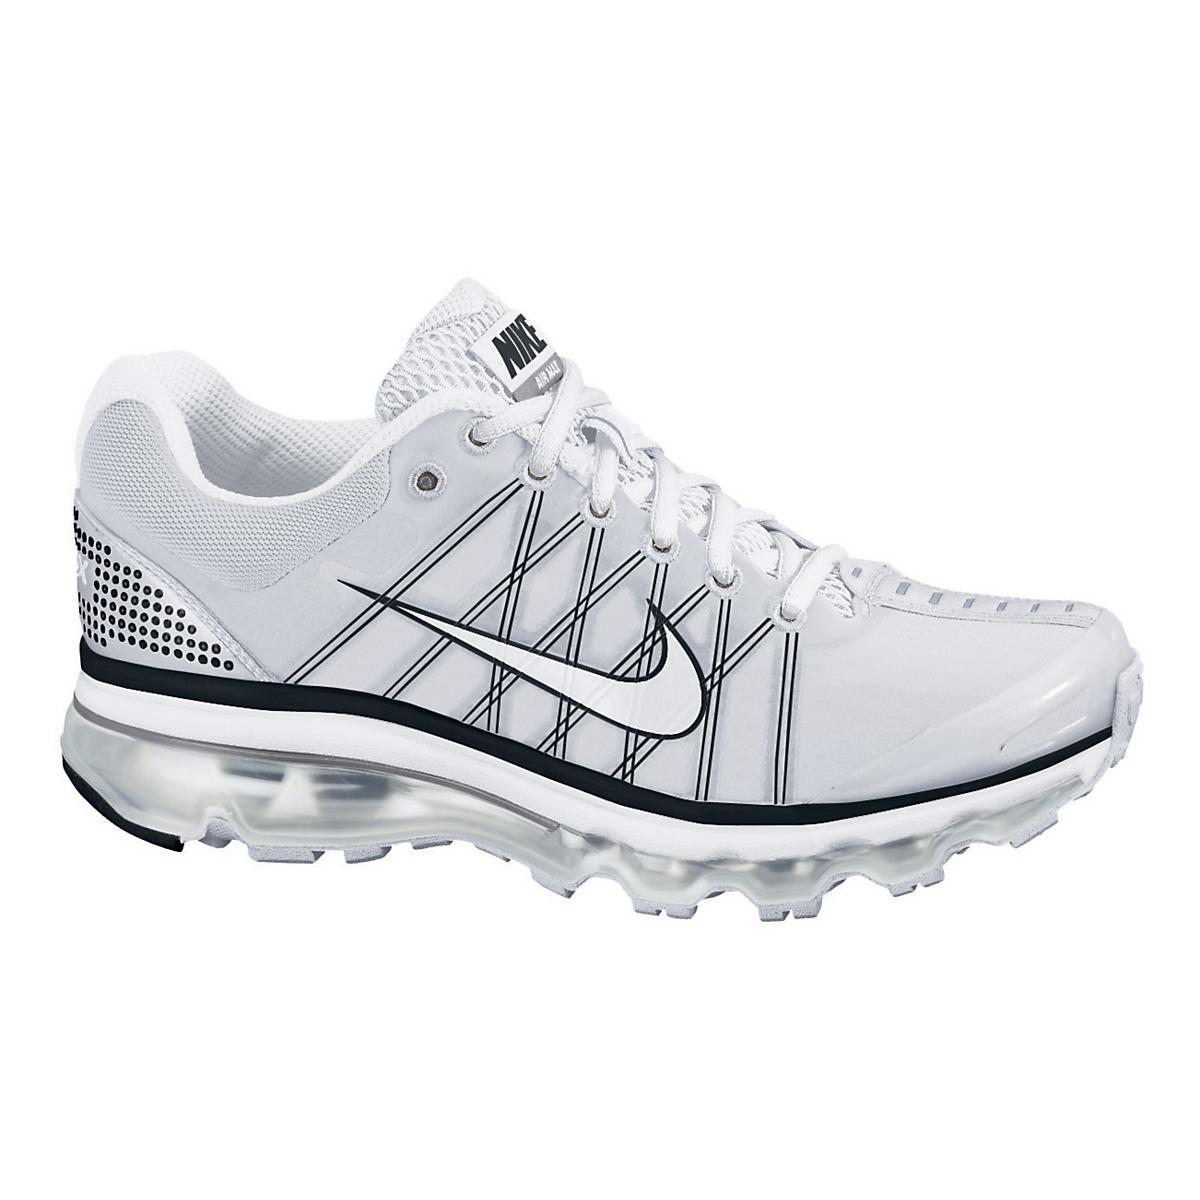 buy online bb049 c82d1 Mens Nike Air Max+ 2009 Running Shoe at Road Runner Sports